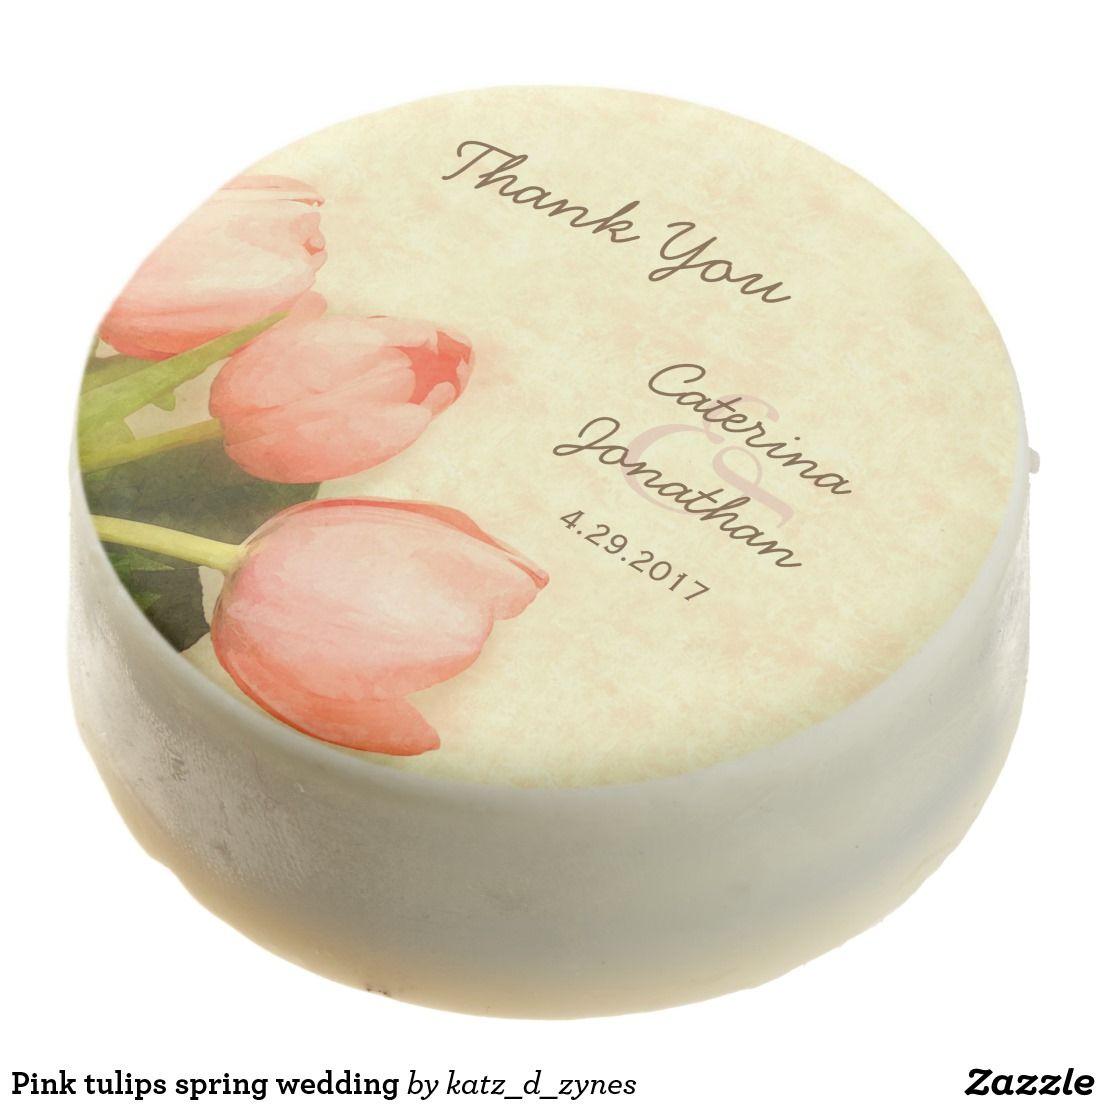 Pink tulips spring wedding chocolate covered oreo | Spring wedding ...